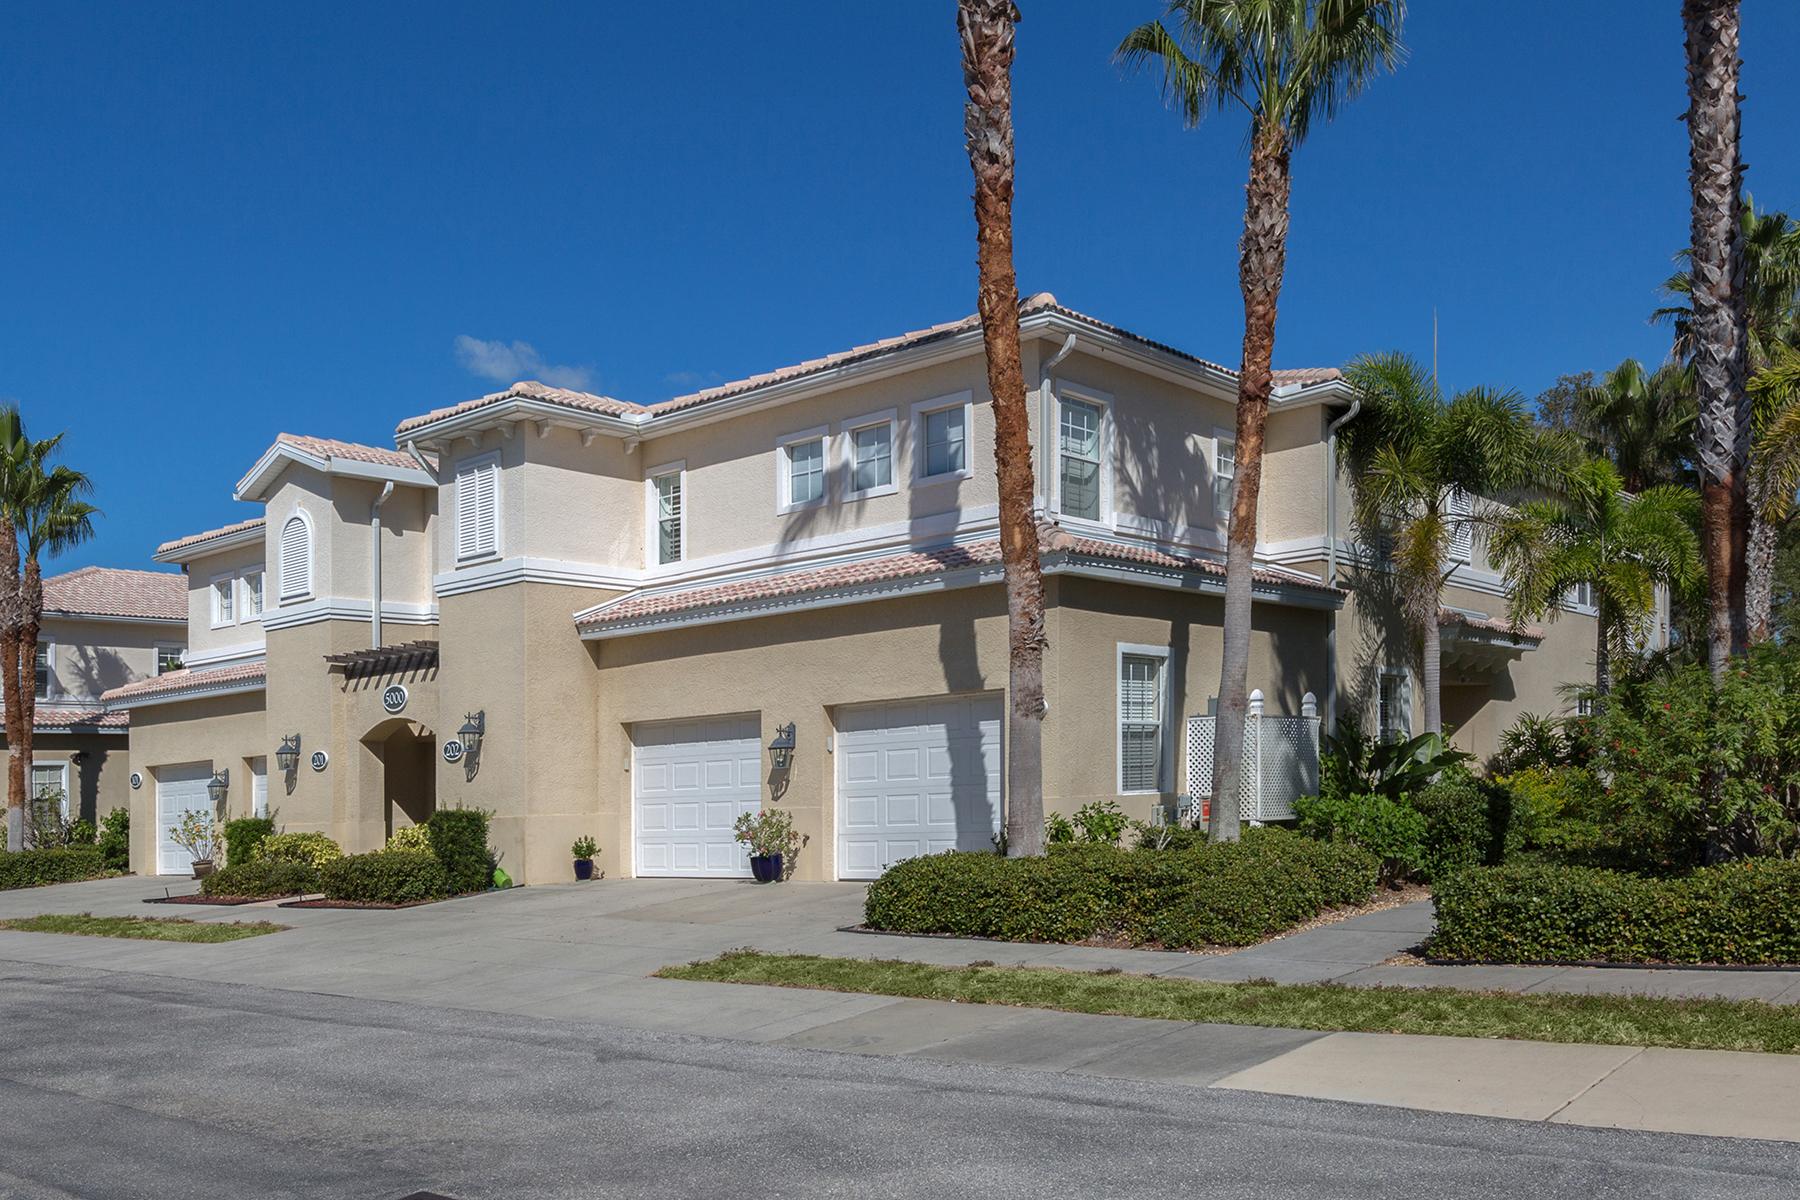 تاون هاوس للـ Sale في ASTON GARDENS 5000 Ibis Way 102, Venice, Florida, 34292 United States